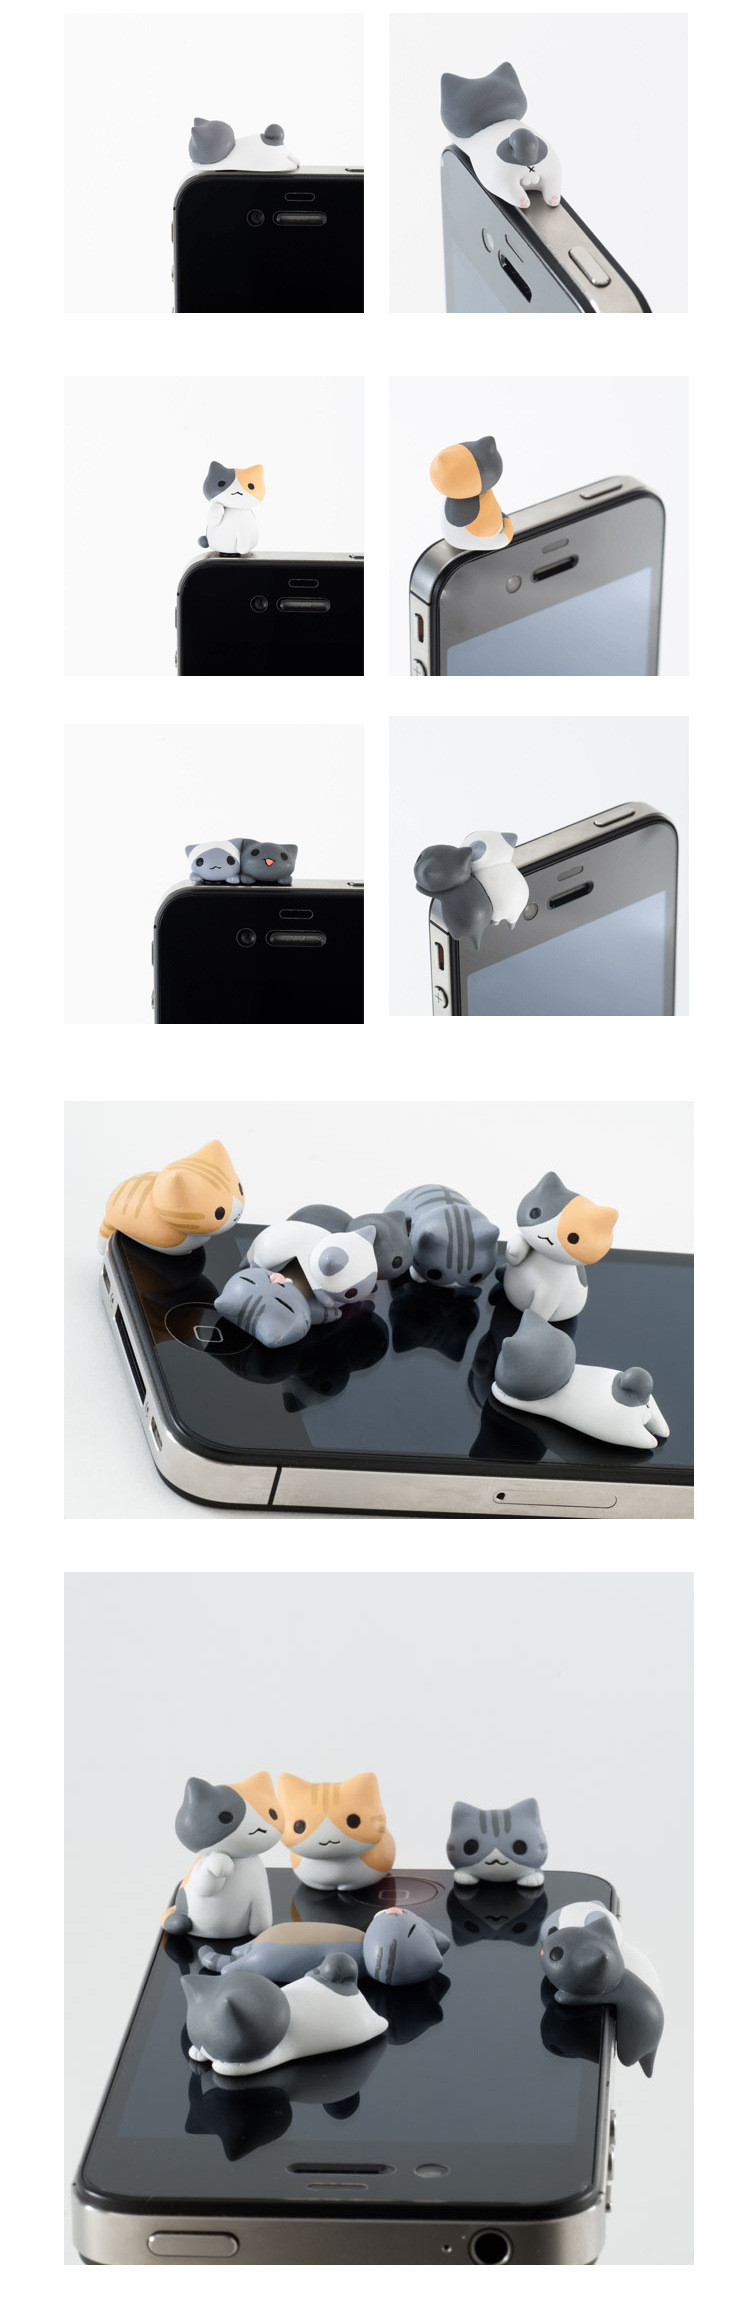 6 Piece Sent At Random Universal 3.5mm phone Earphone Jack Plug Super Cute Dust Plug Cat Cute kitten dust-proof Stopper Cap 5